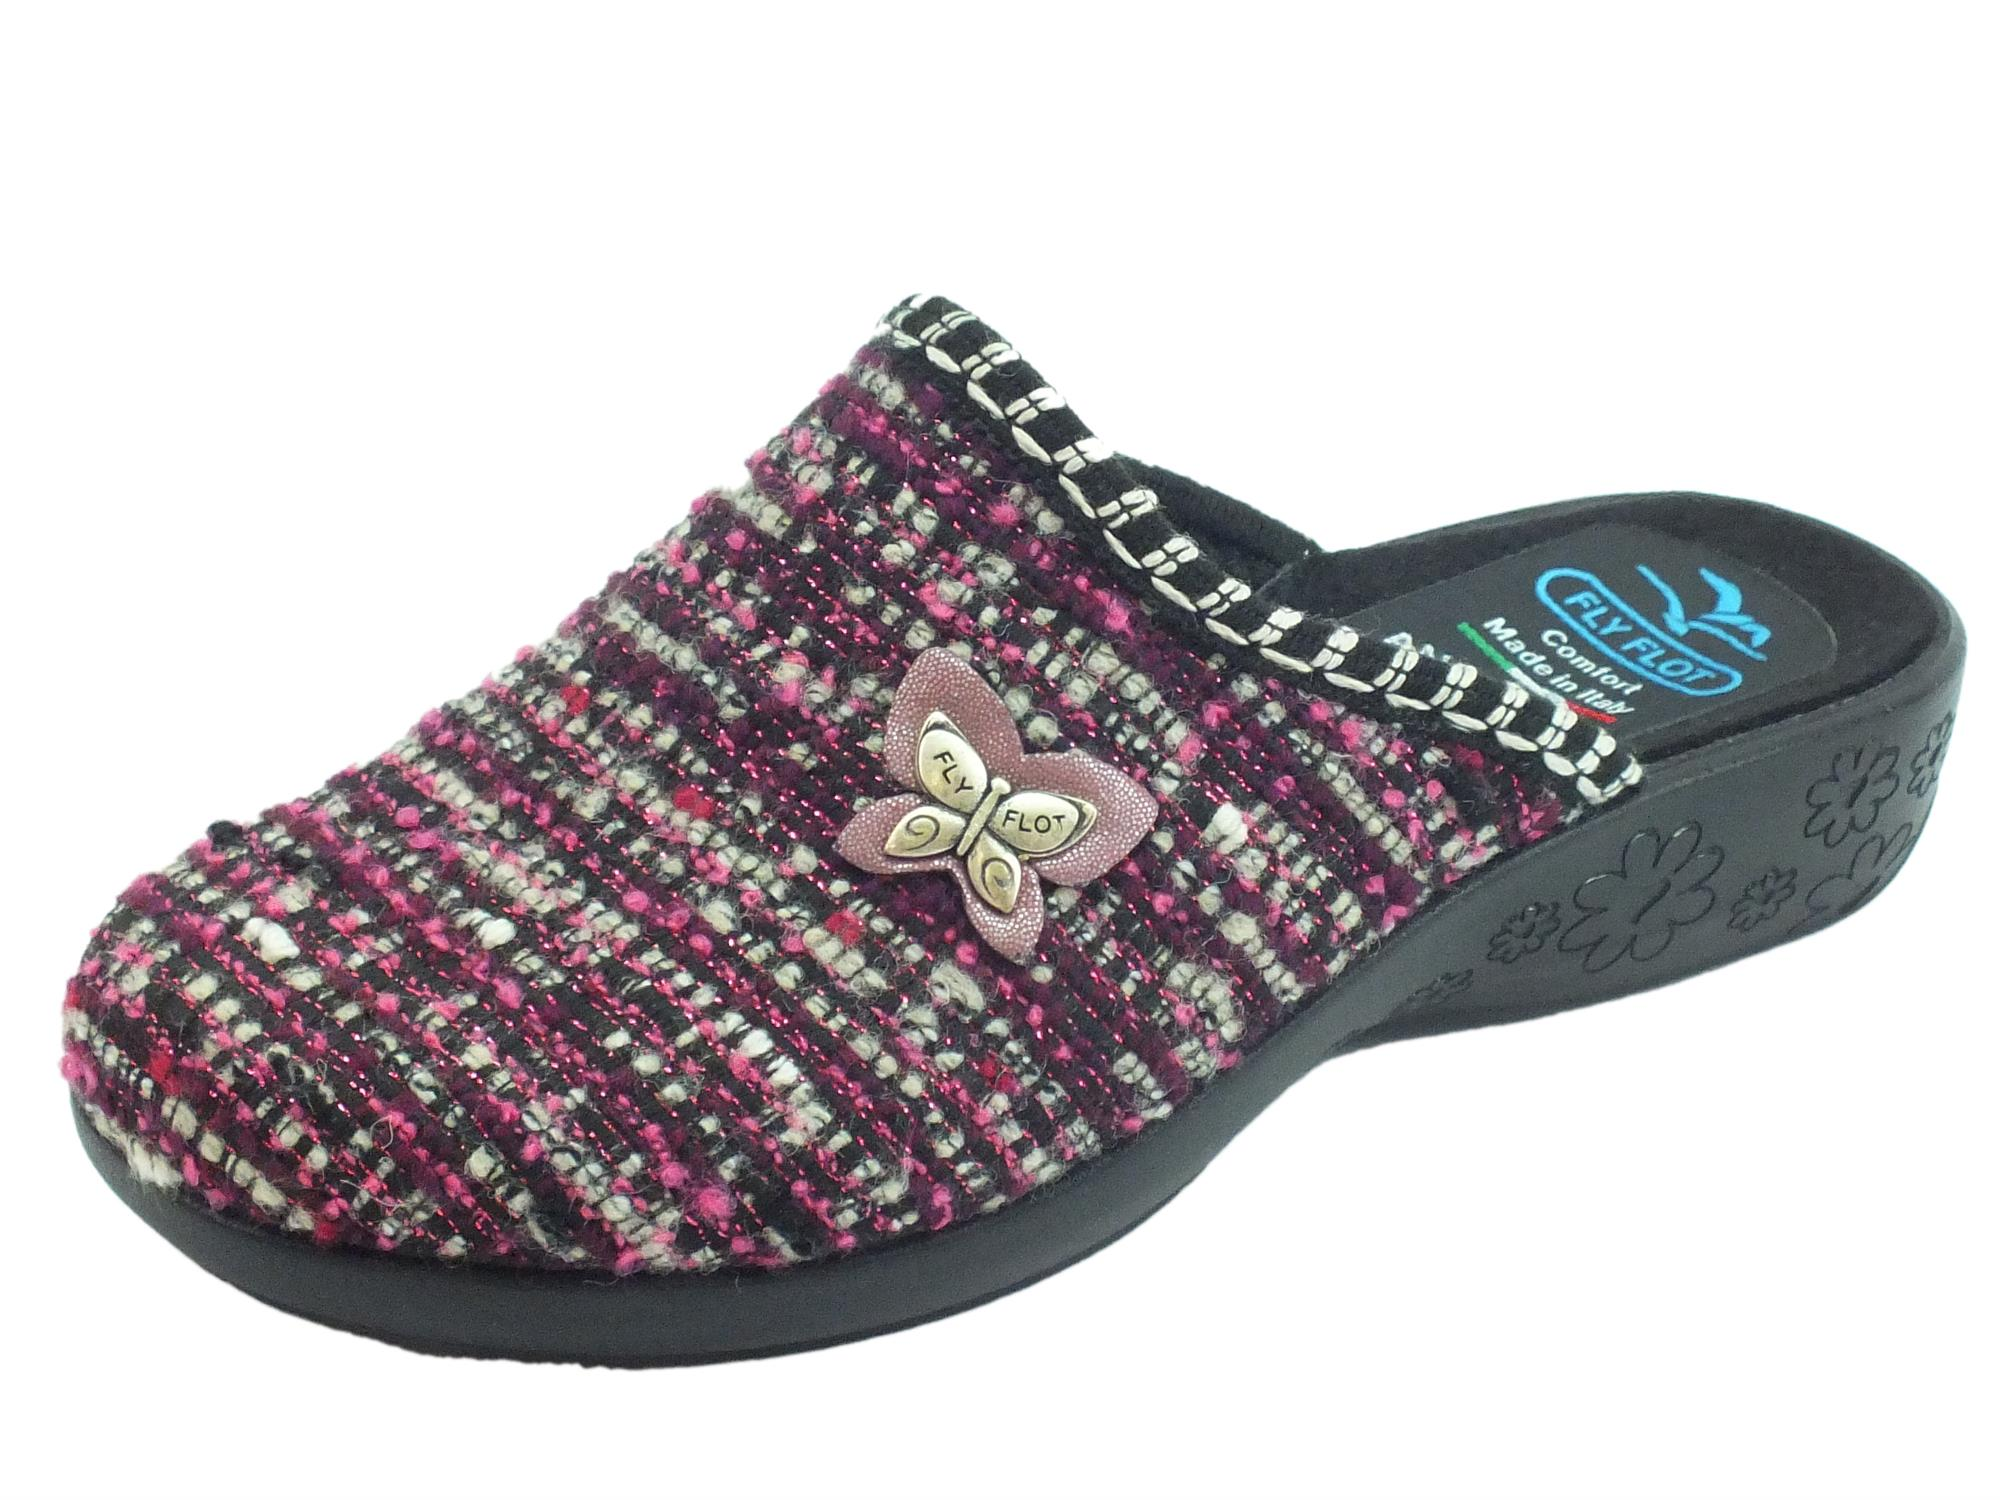 Pantofole FlyFlot donna lana ciclamino - Vitiello Calzature 5c5a68b3896